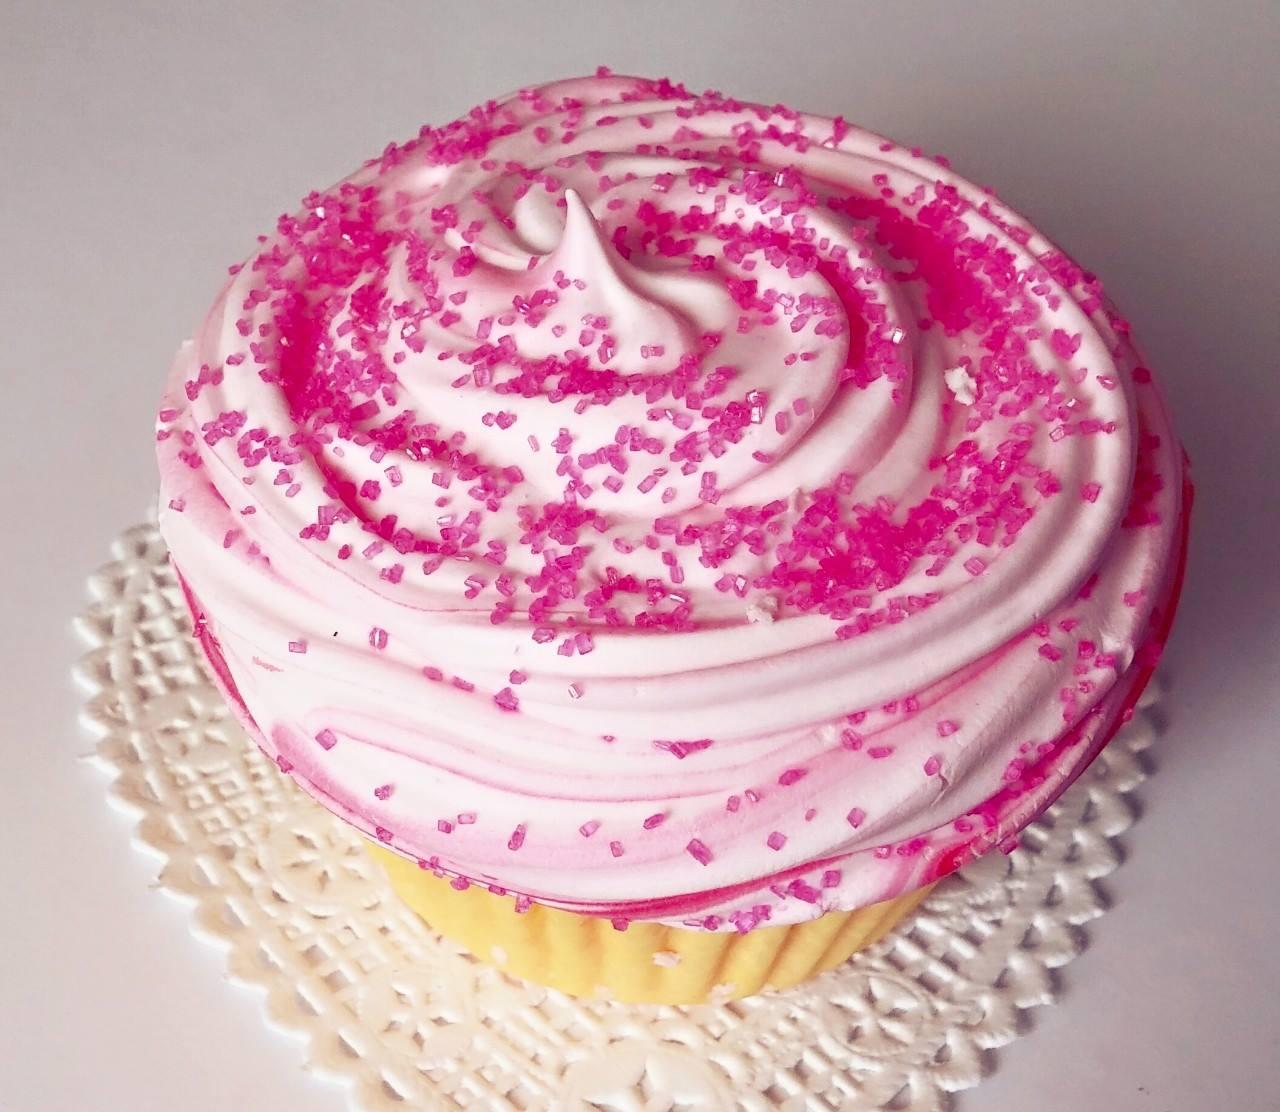 Homemade Cupcake Bath Bomb Fizzy- Pink Sugar · Vashir ...